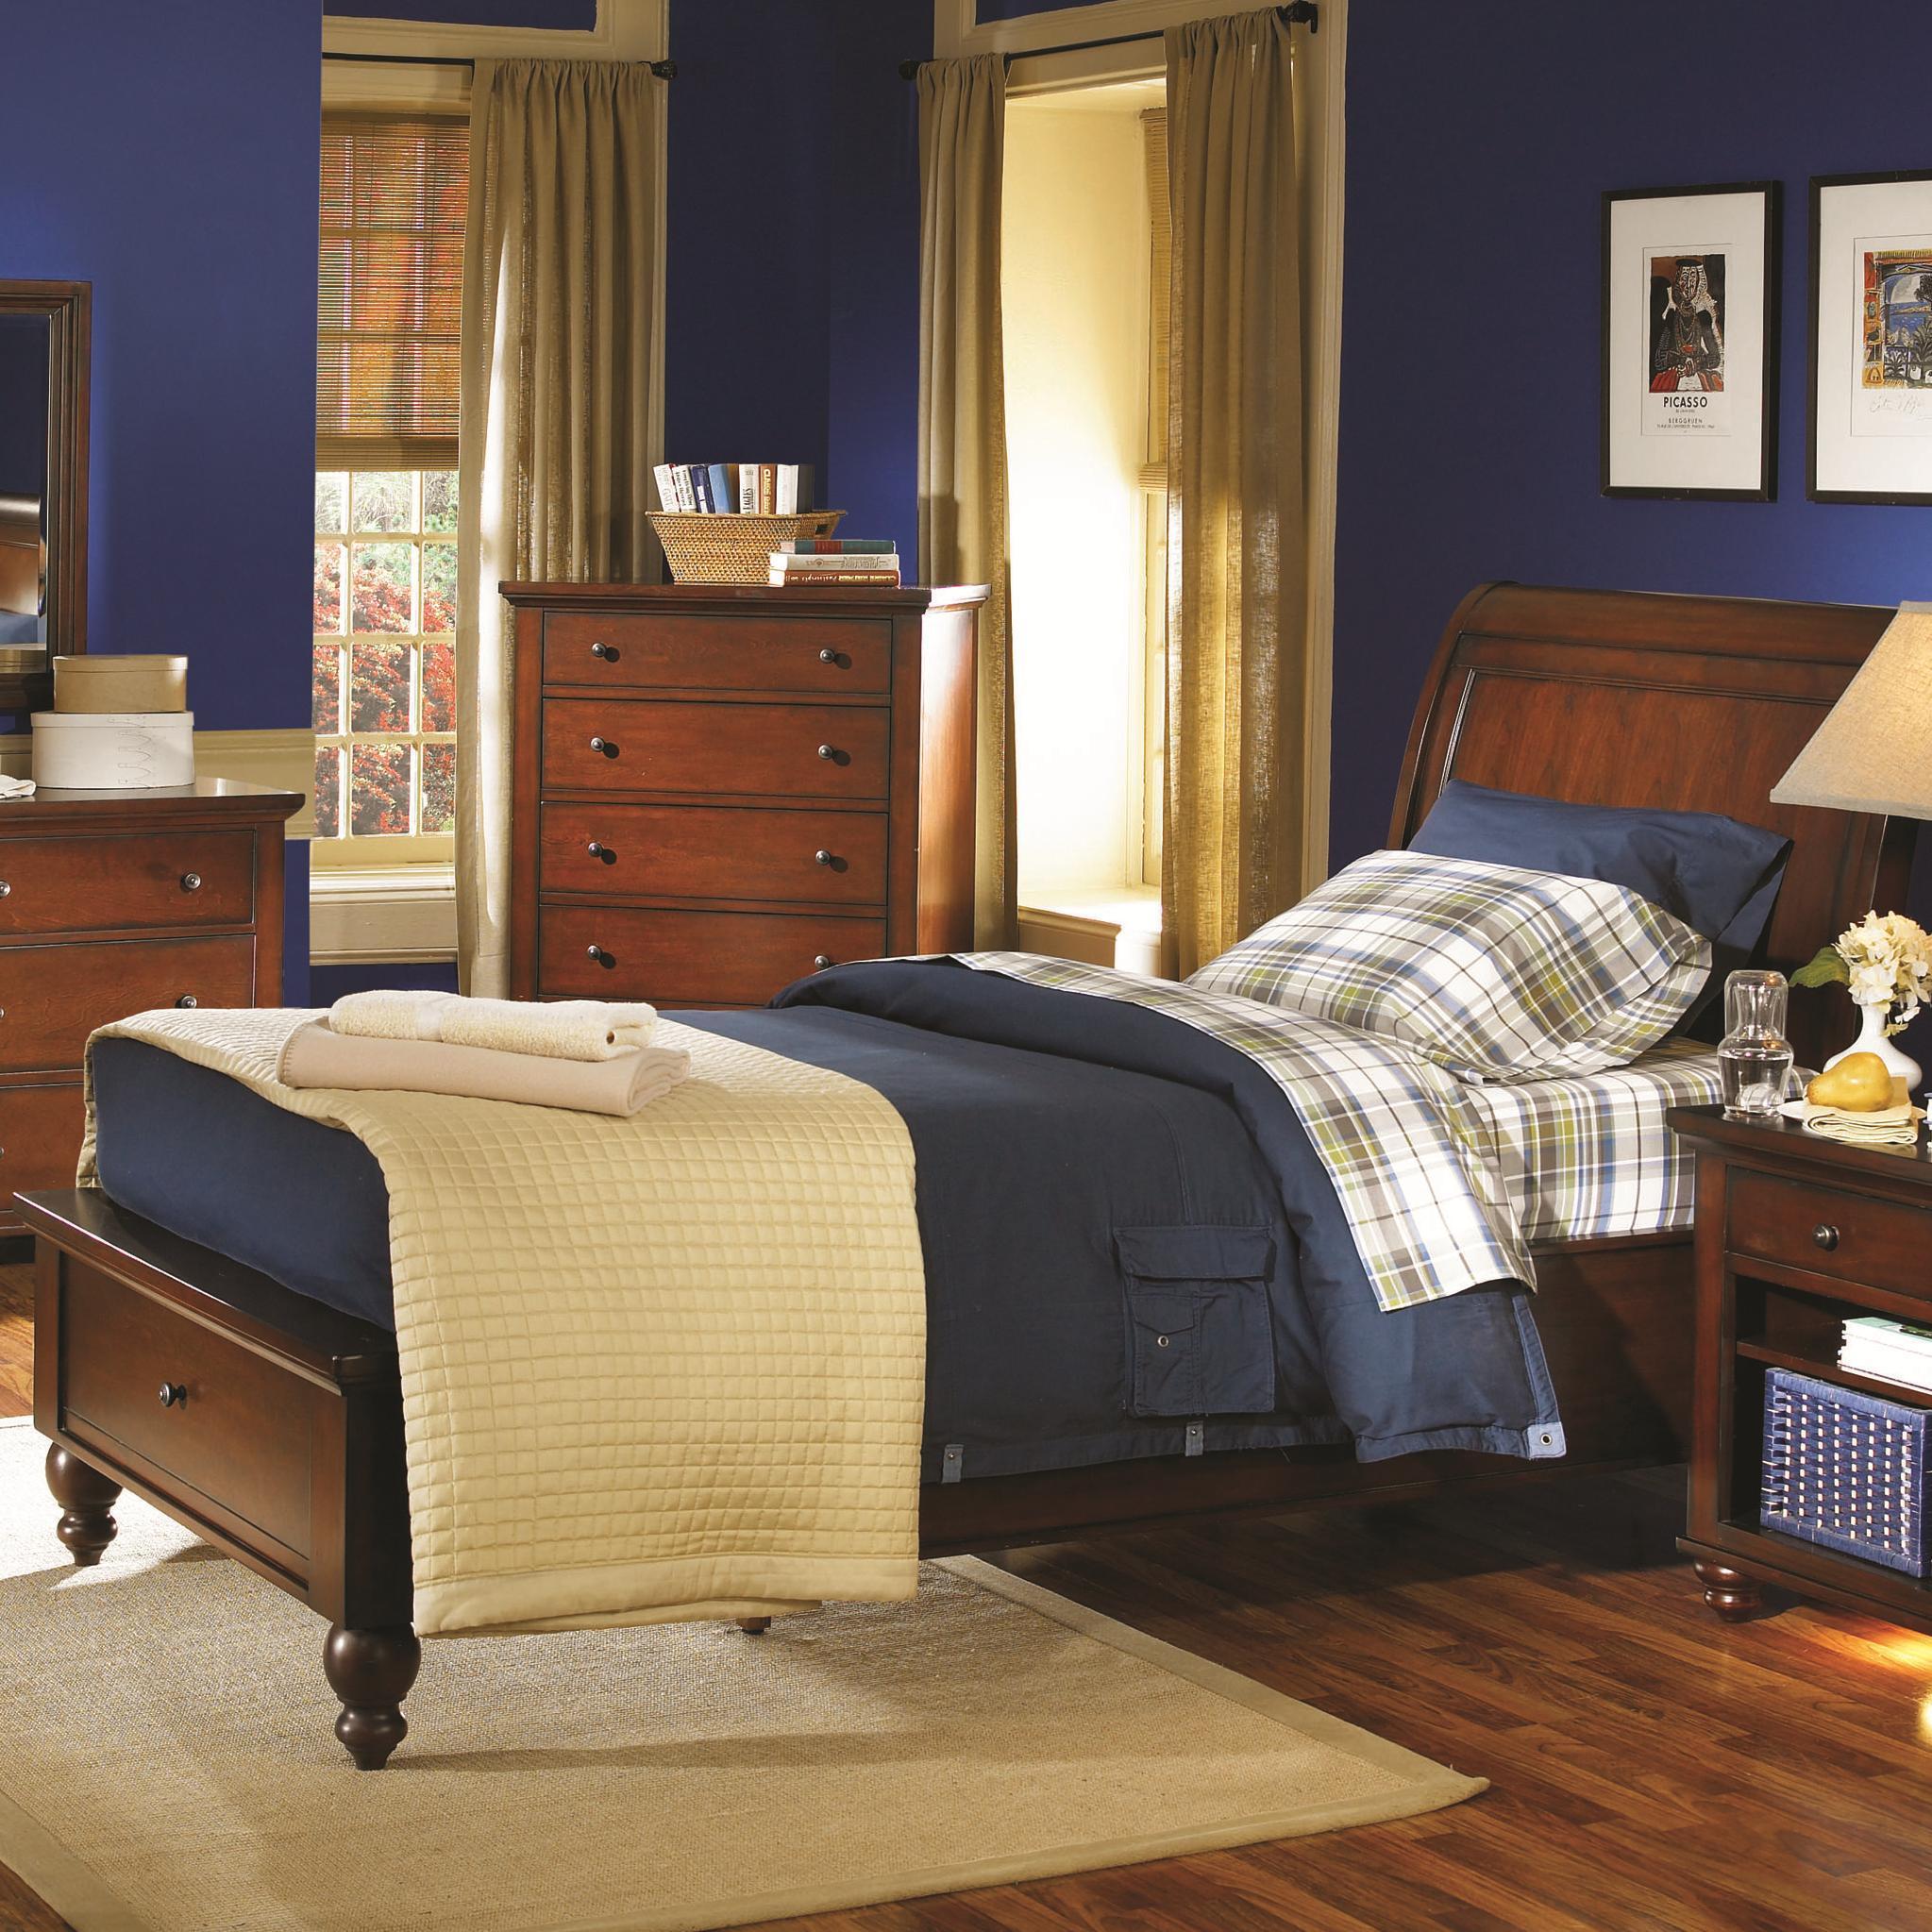 Aspenhome Cambridge Twin Size Bed With Sleigh Headboard Drawer Storage Footboard Wayside